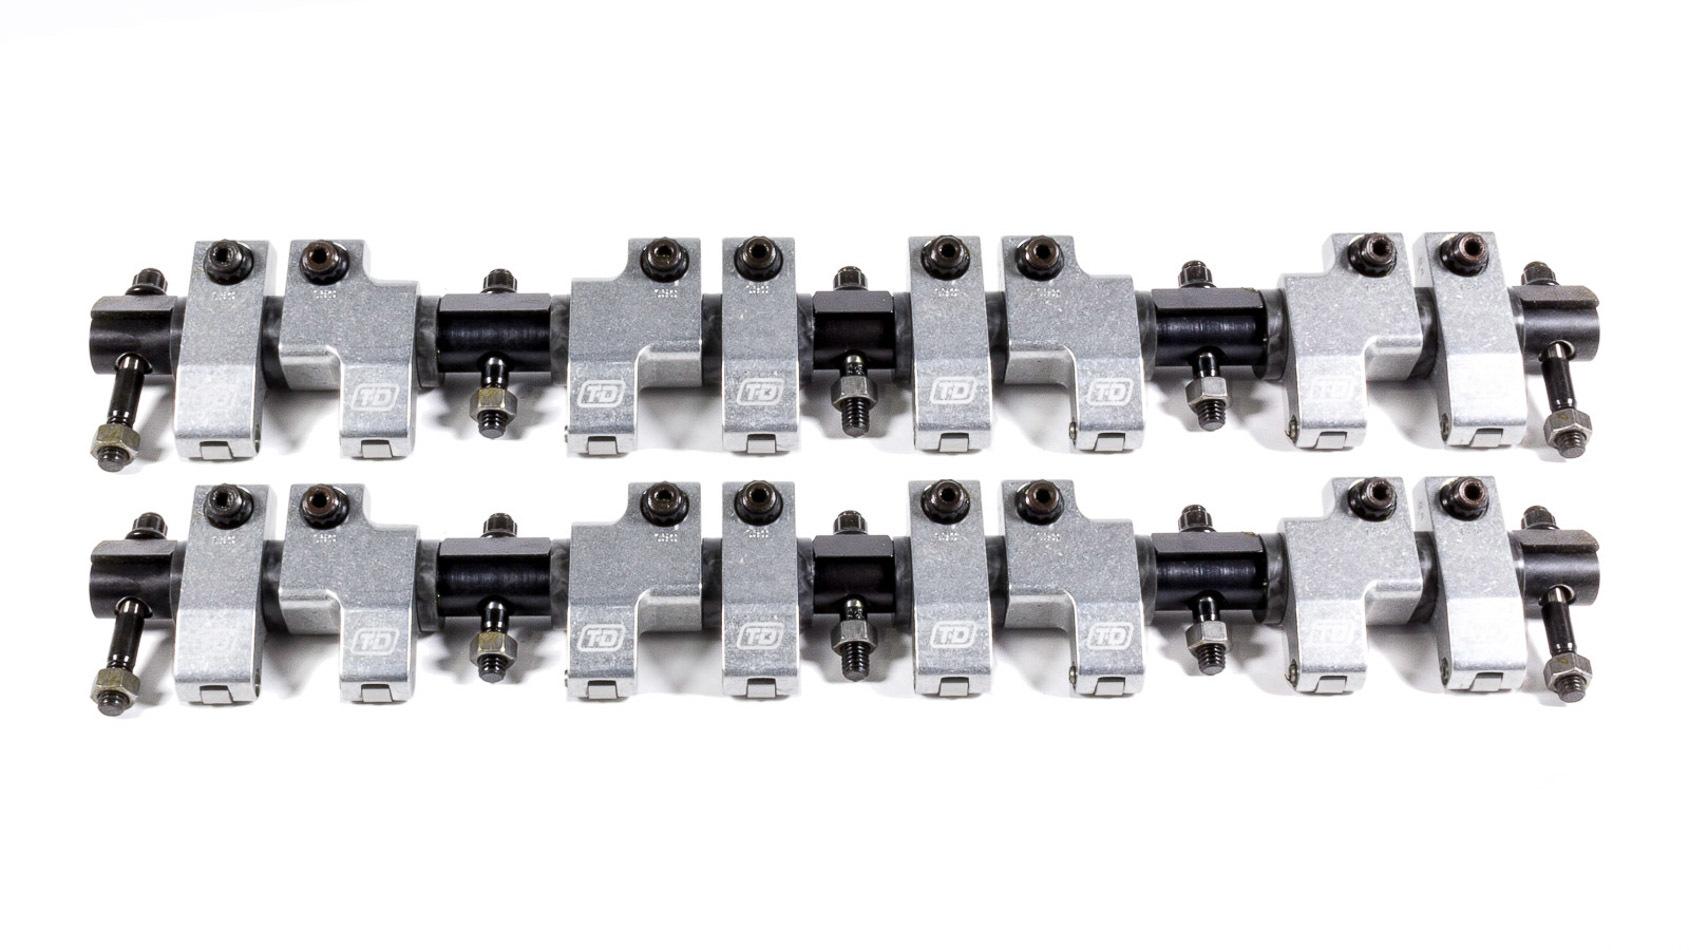 T&D Machine 8210-160/160 Rocker Arm, Shaft Mount, 1.60 Ratio, Full Roller, Aluminum, Natural, Indy 440-1 / 440-C Single Shaft, Mopar RB-Series, Kit